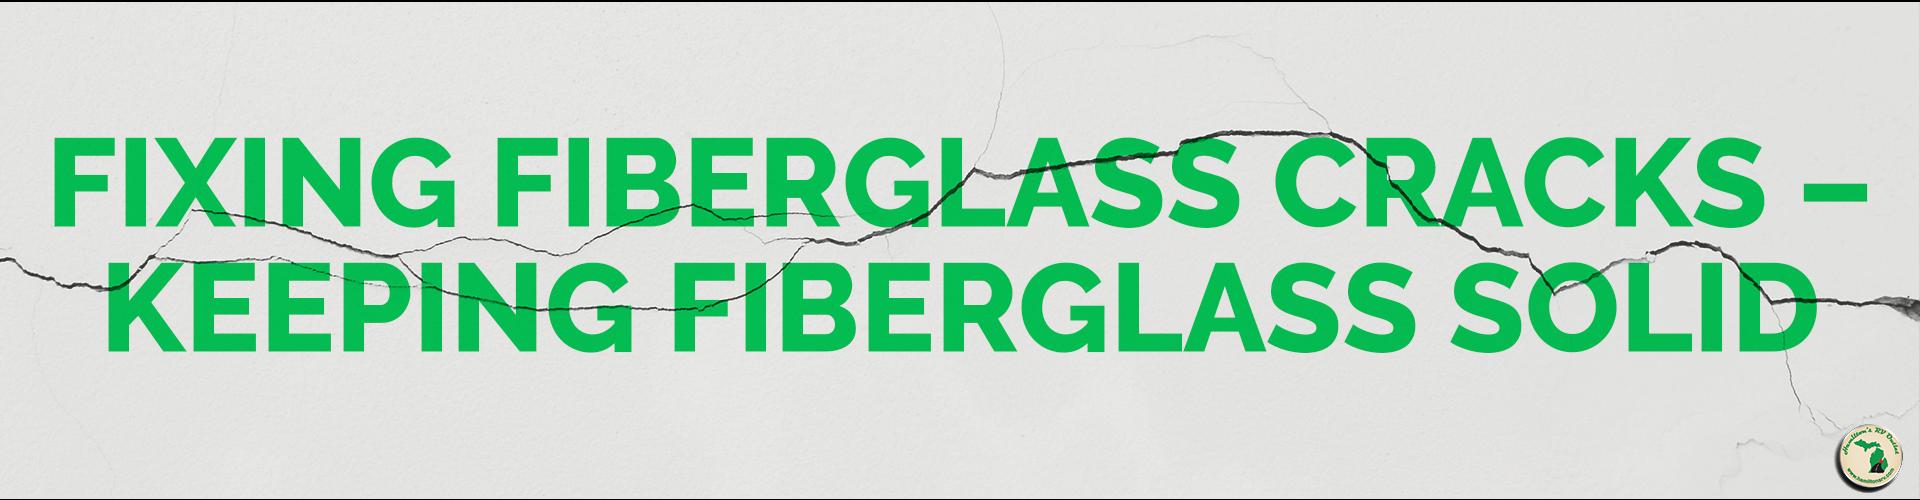 Fixing Fiberglass Cracks – Keeping Fiberglass Solid